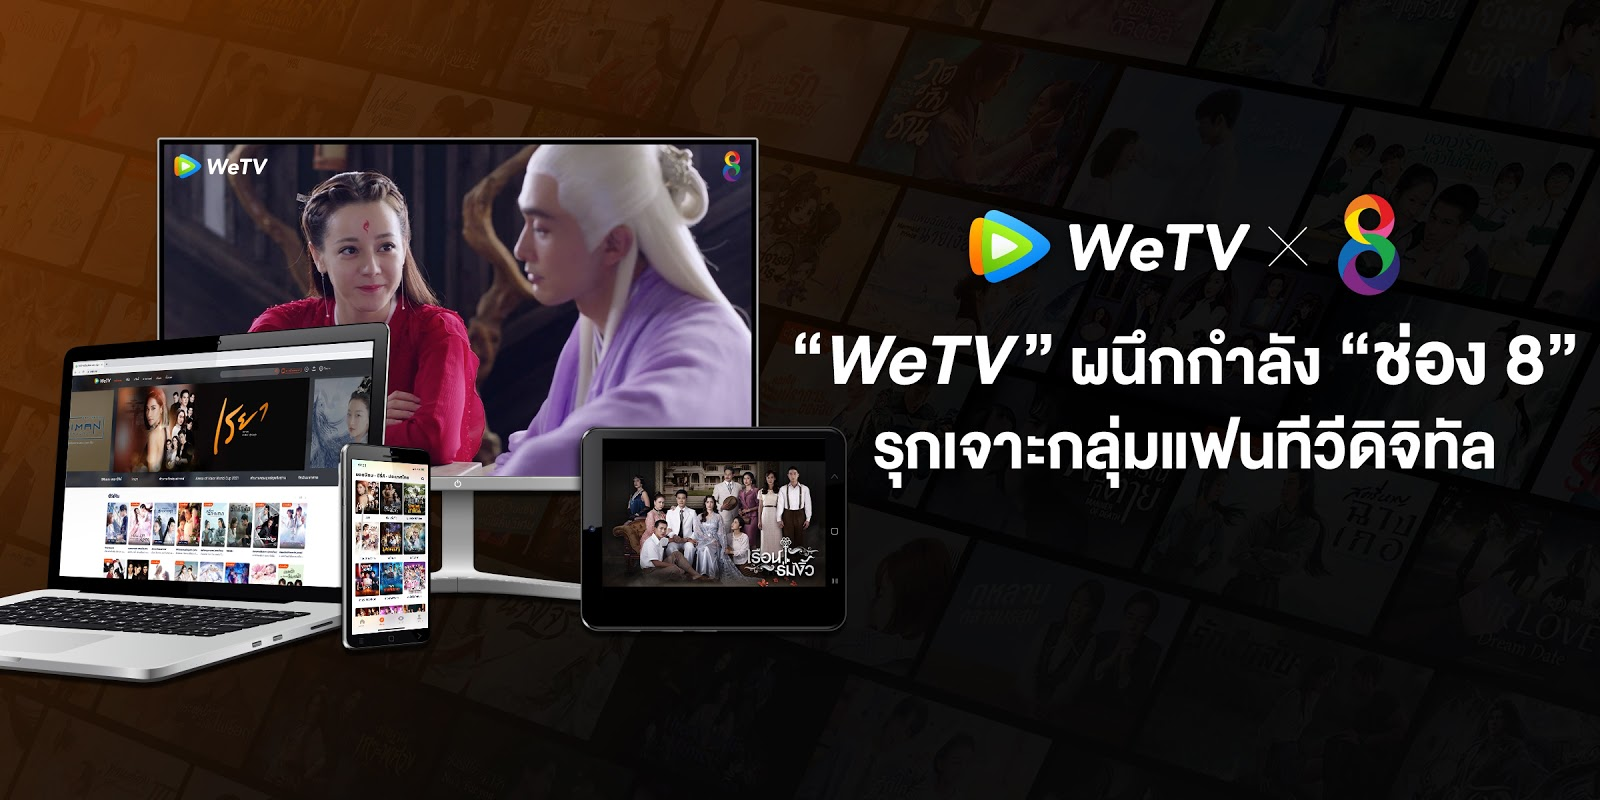 "WeTV ผนึกกำลัง "" ช่อง 8 "" รุกเจาะกลุ่มแฟนทีวีดิจิทัลตั้งเป้าขยายฐานคนดูครอบคลุมออนไลน์ และออนแอร์"